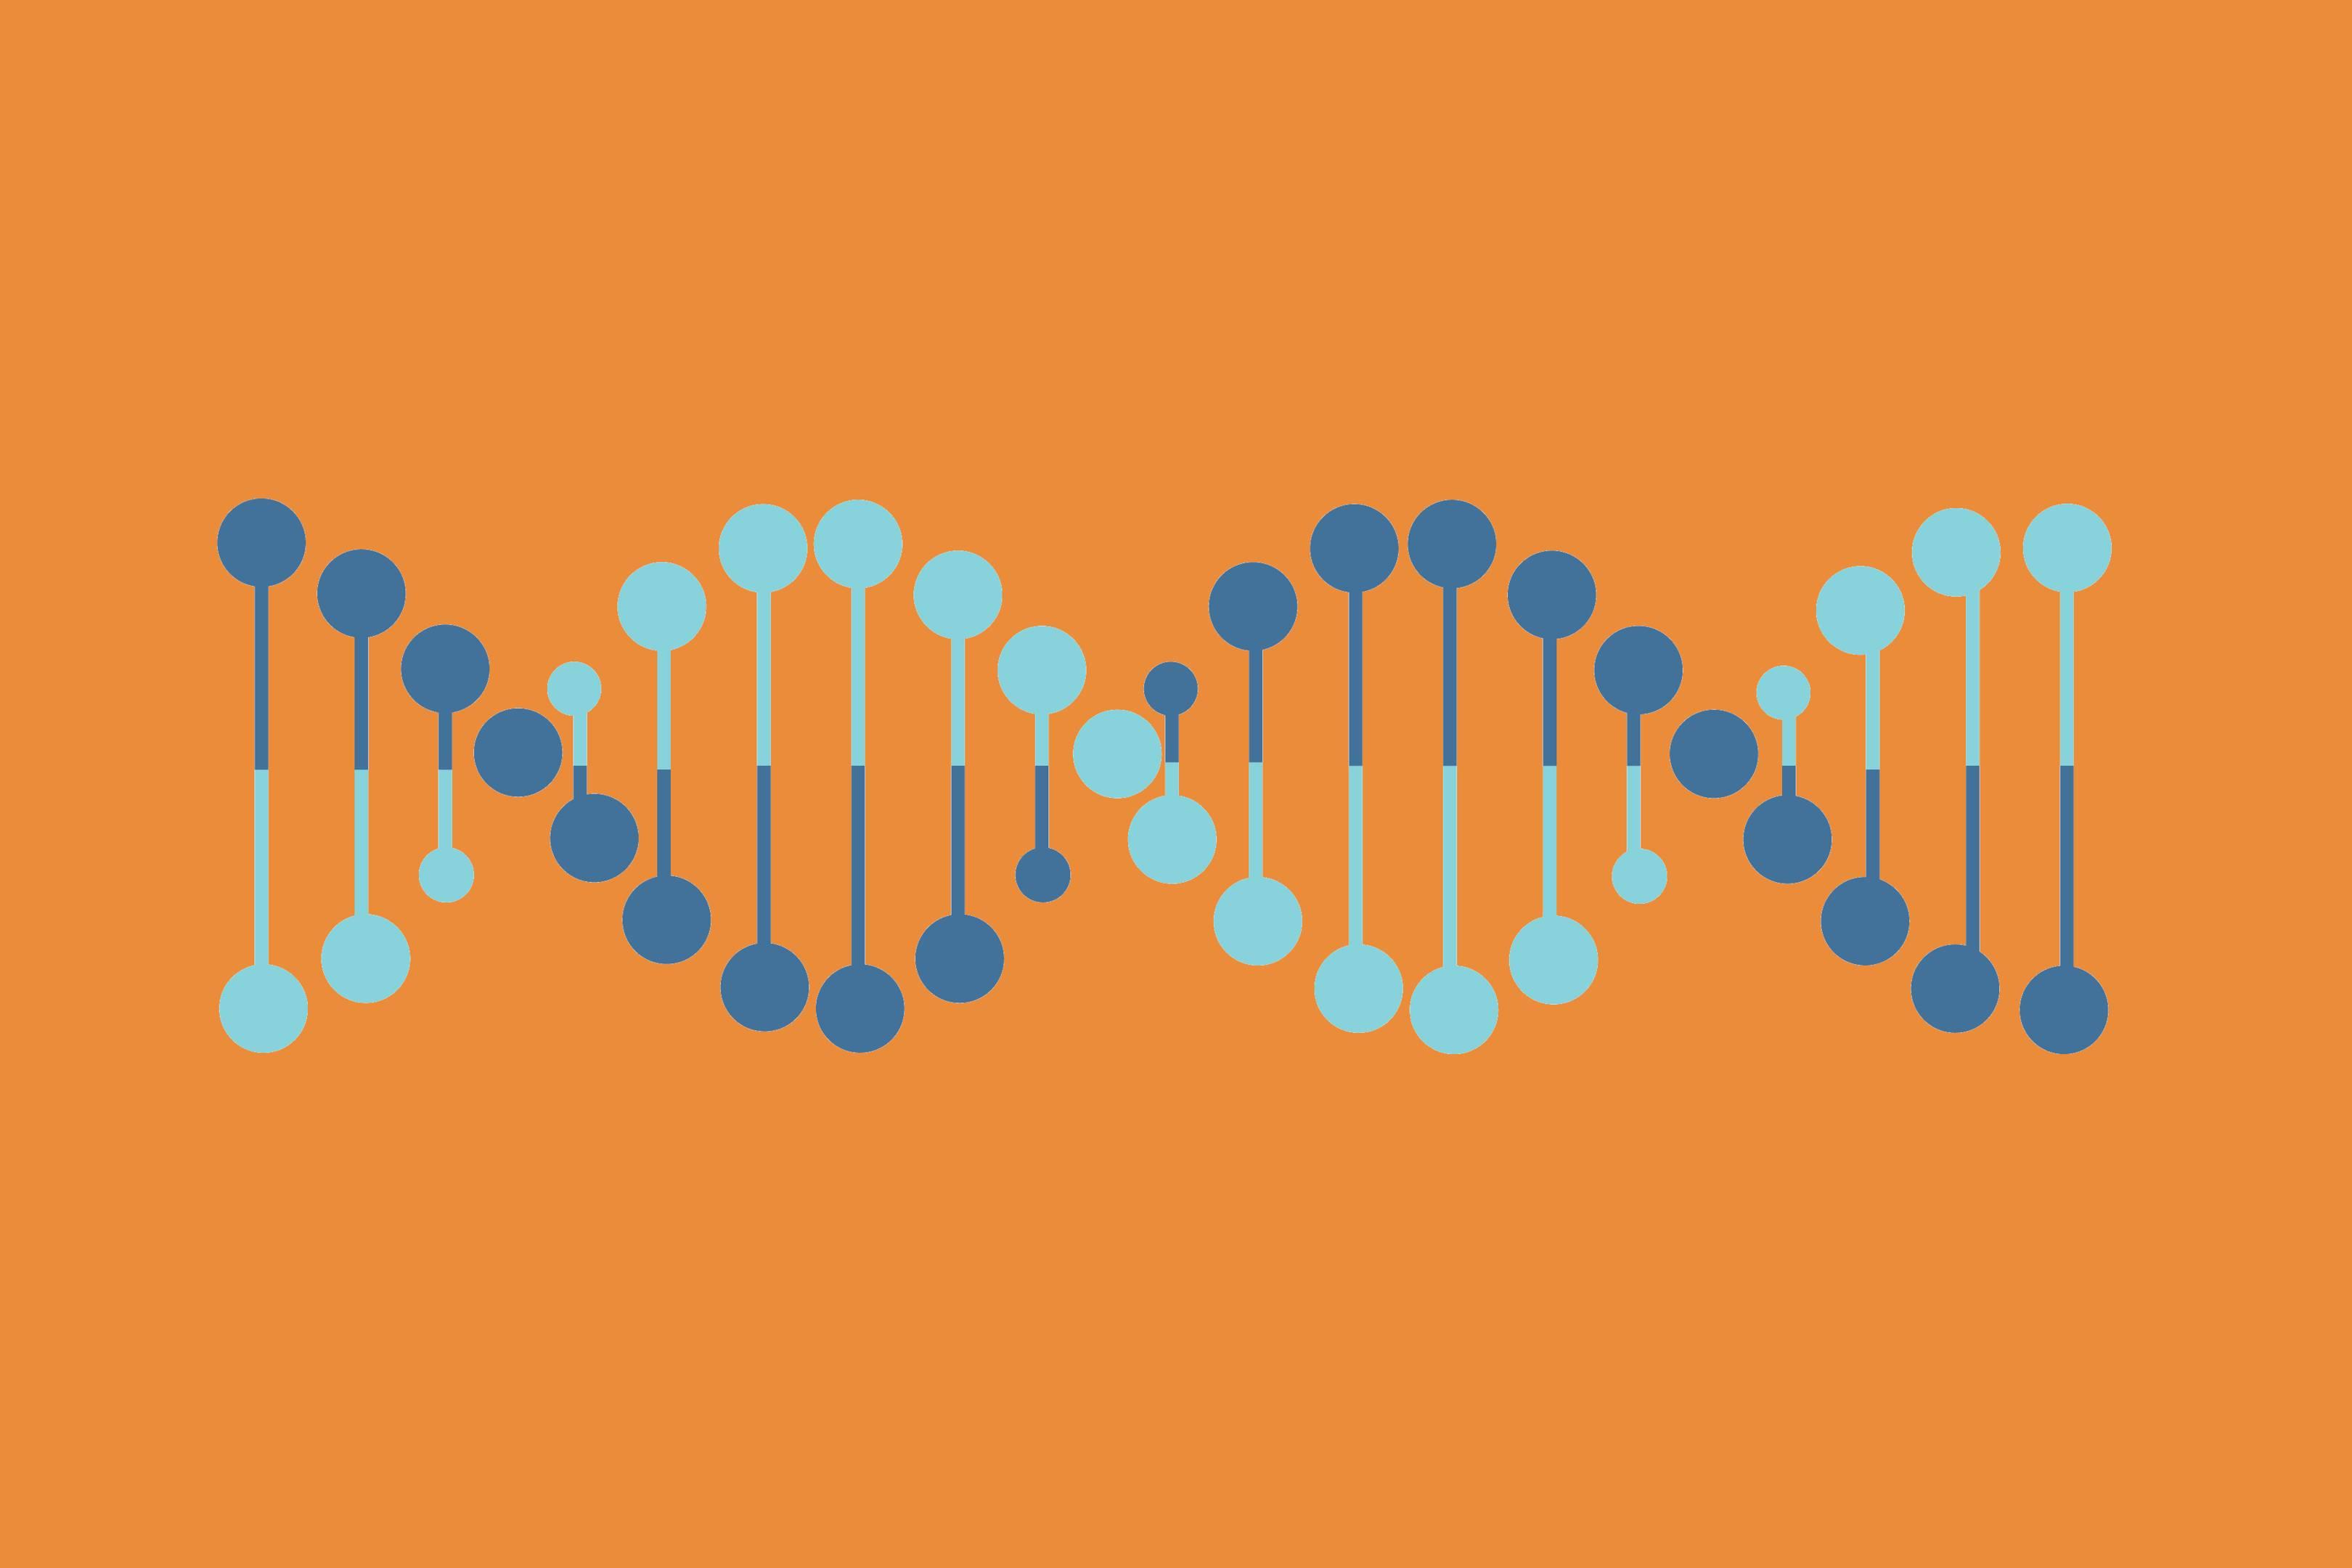 gene revolution definition